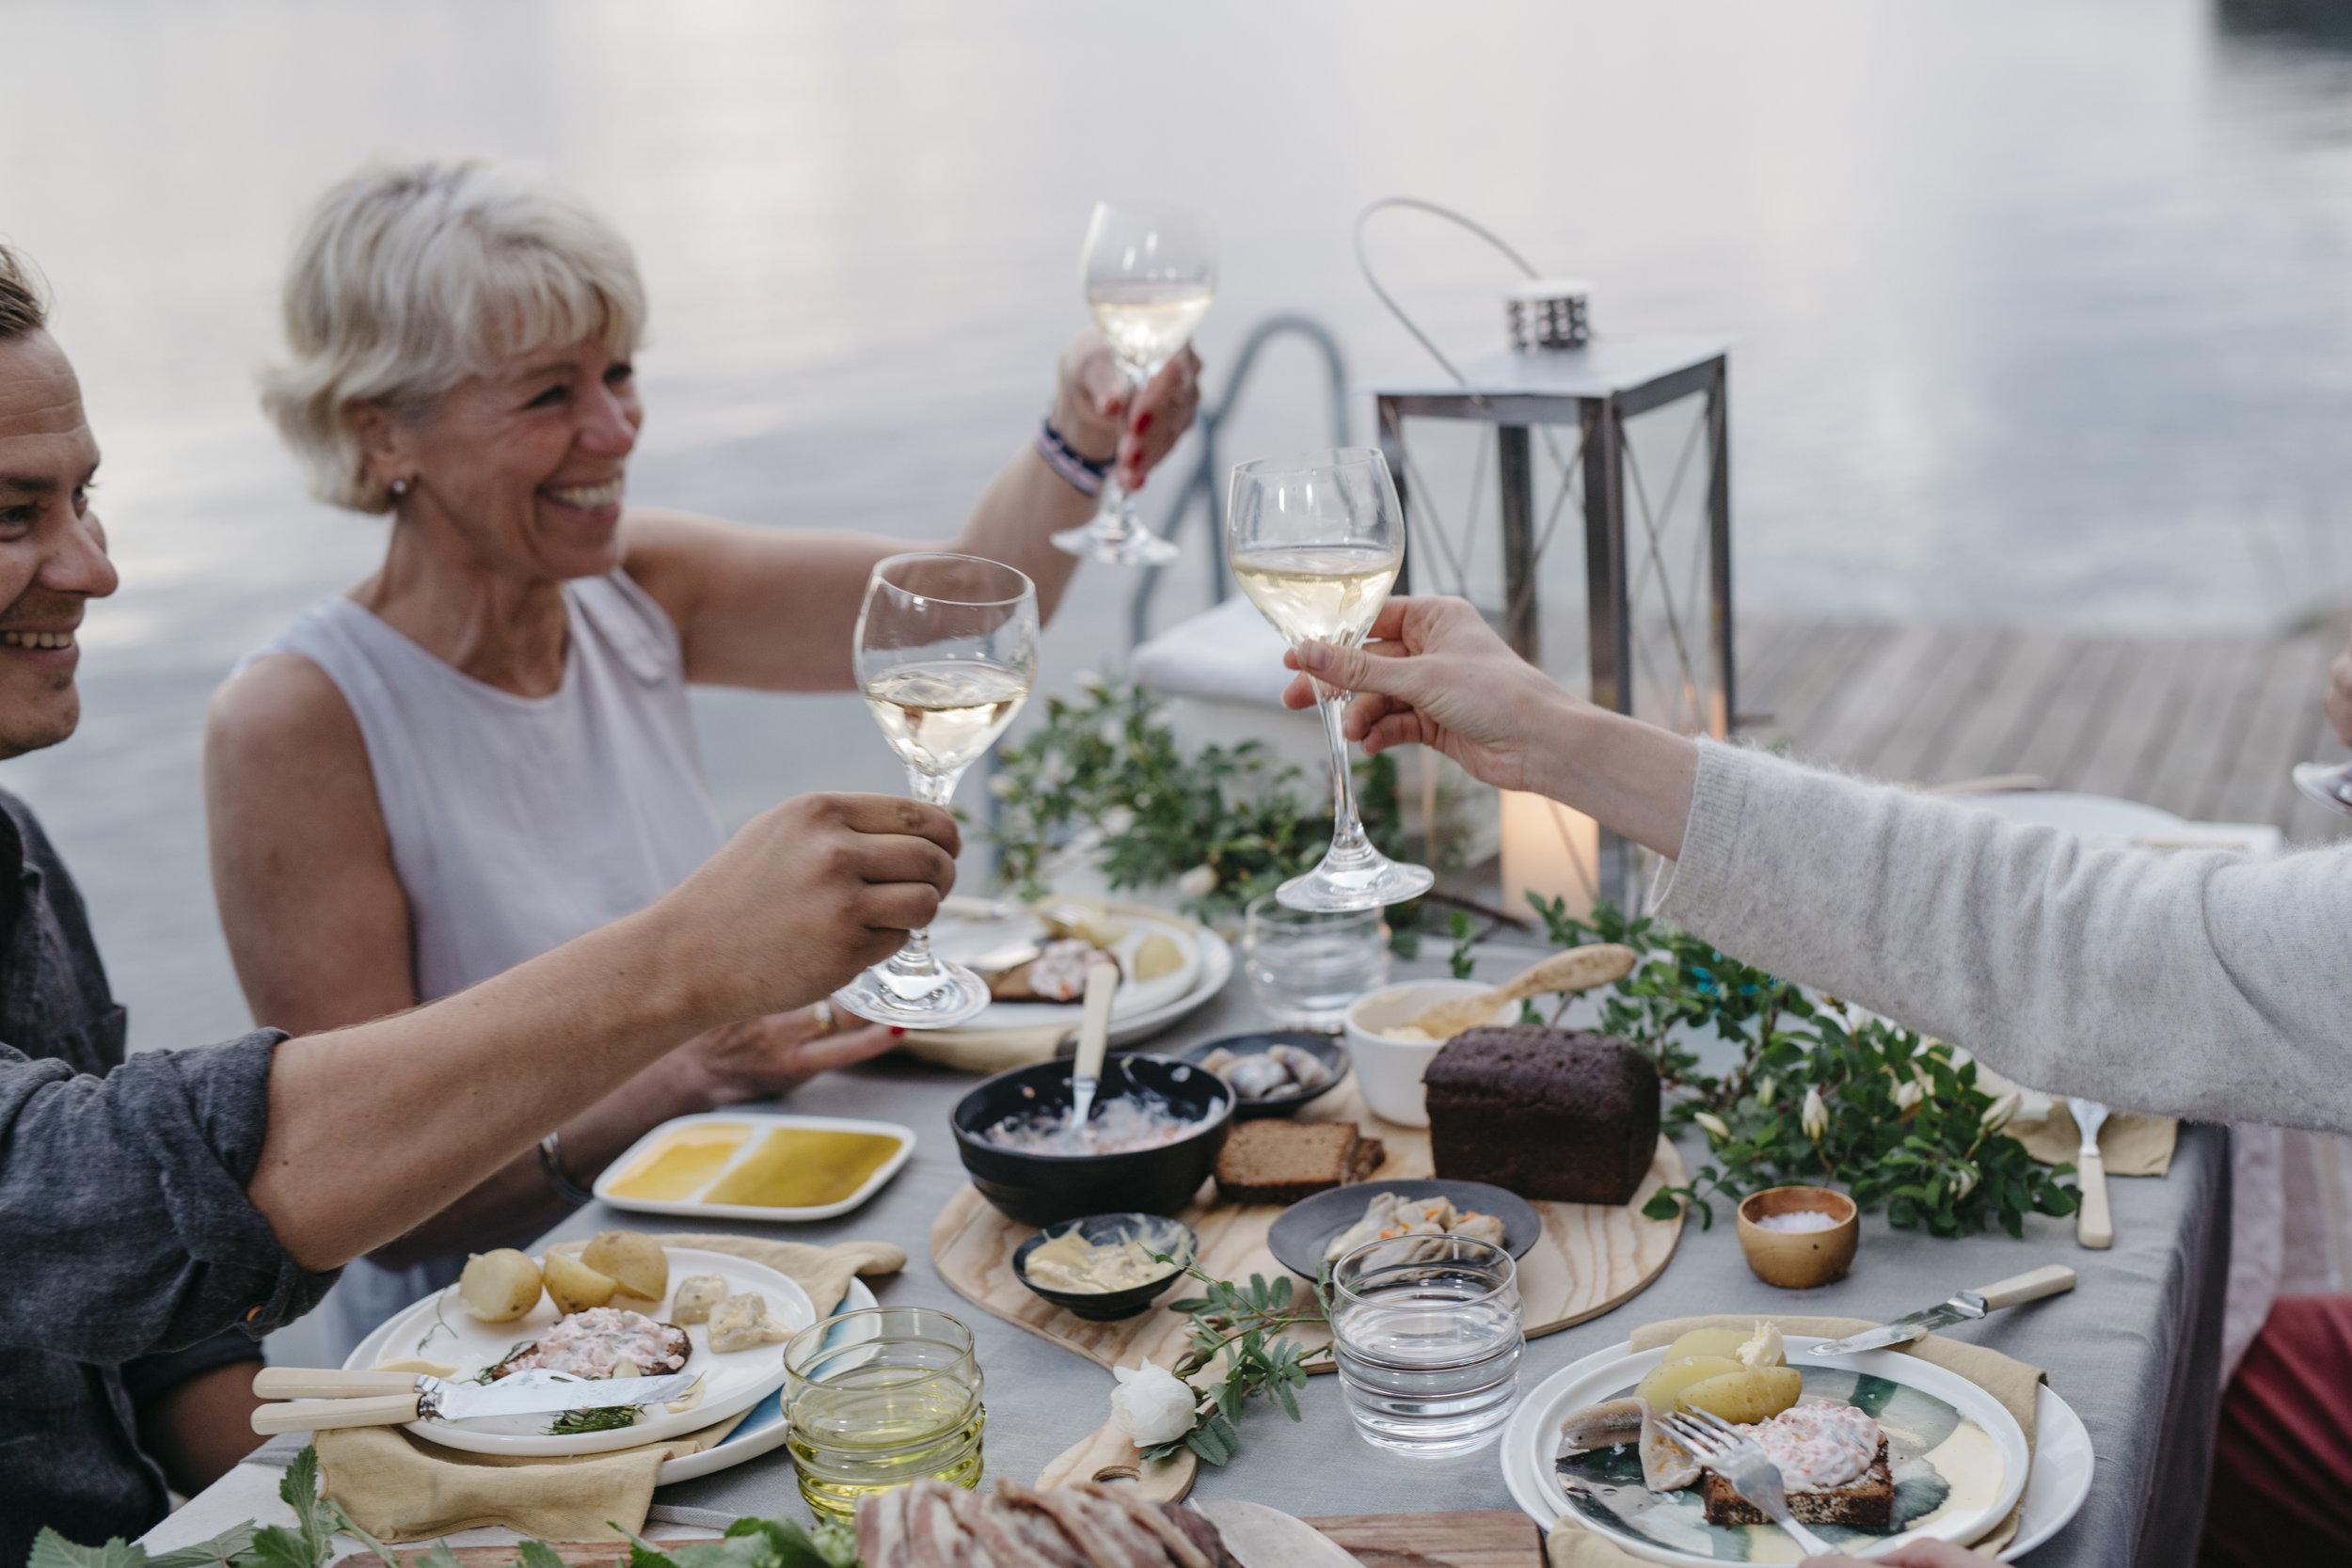 Visit Finland / Summer Food